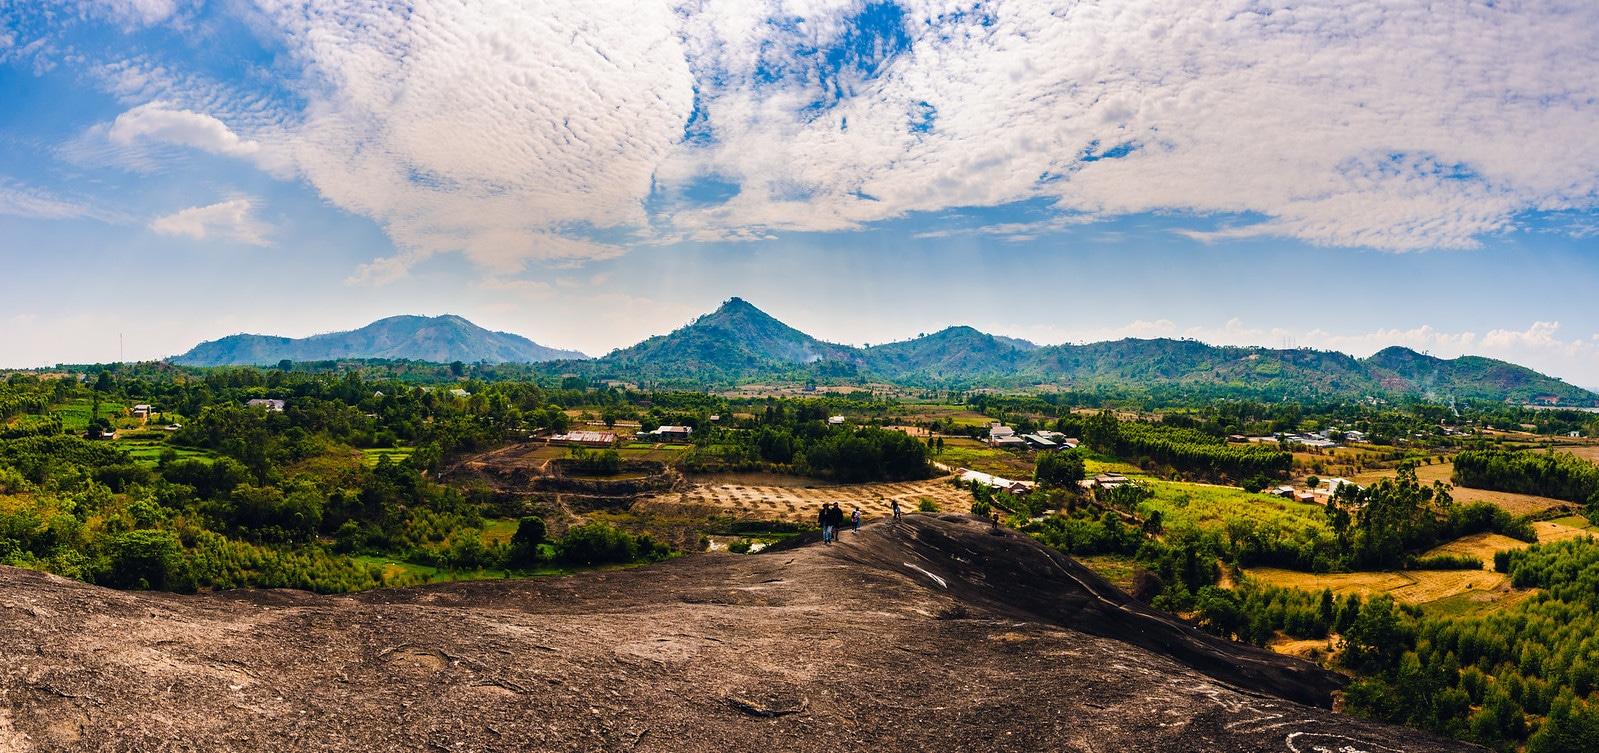 Landscape in Dak Lak Province Vietnam